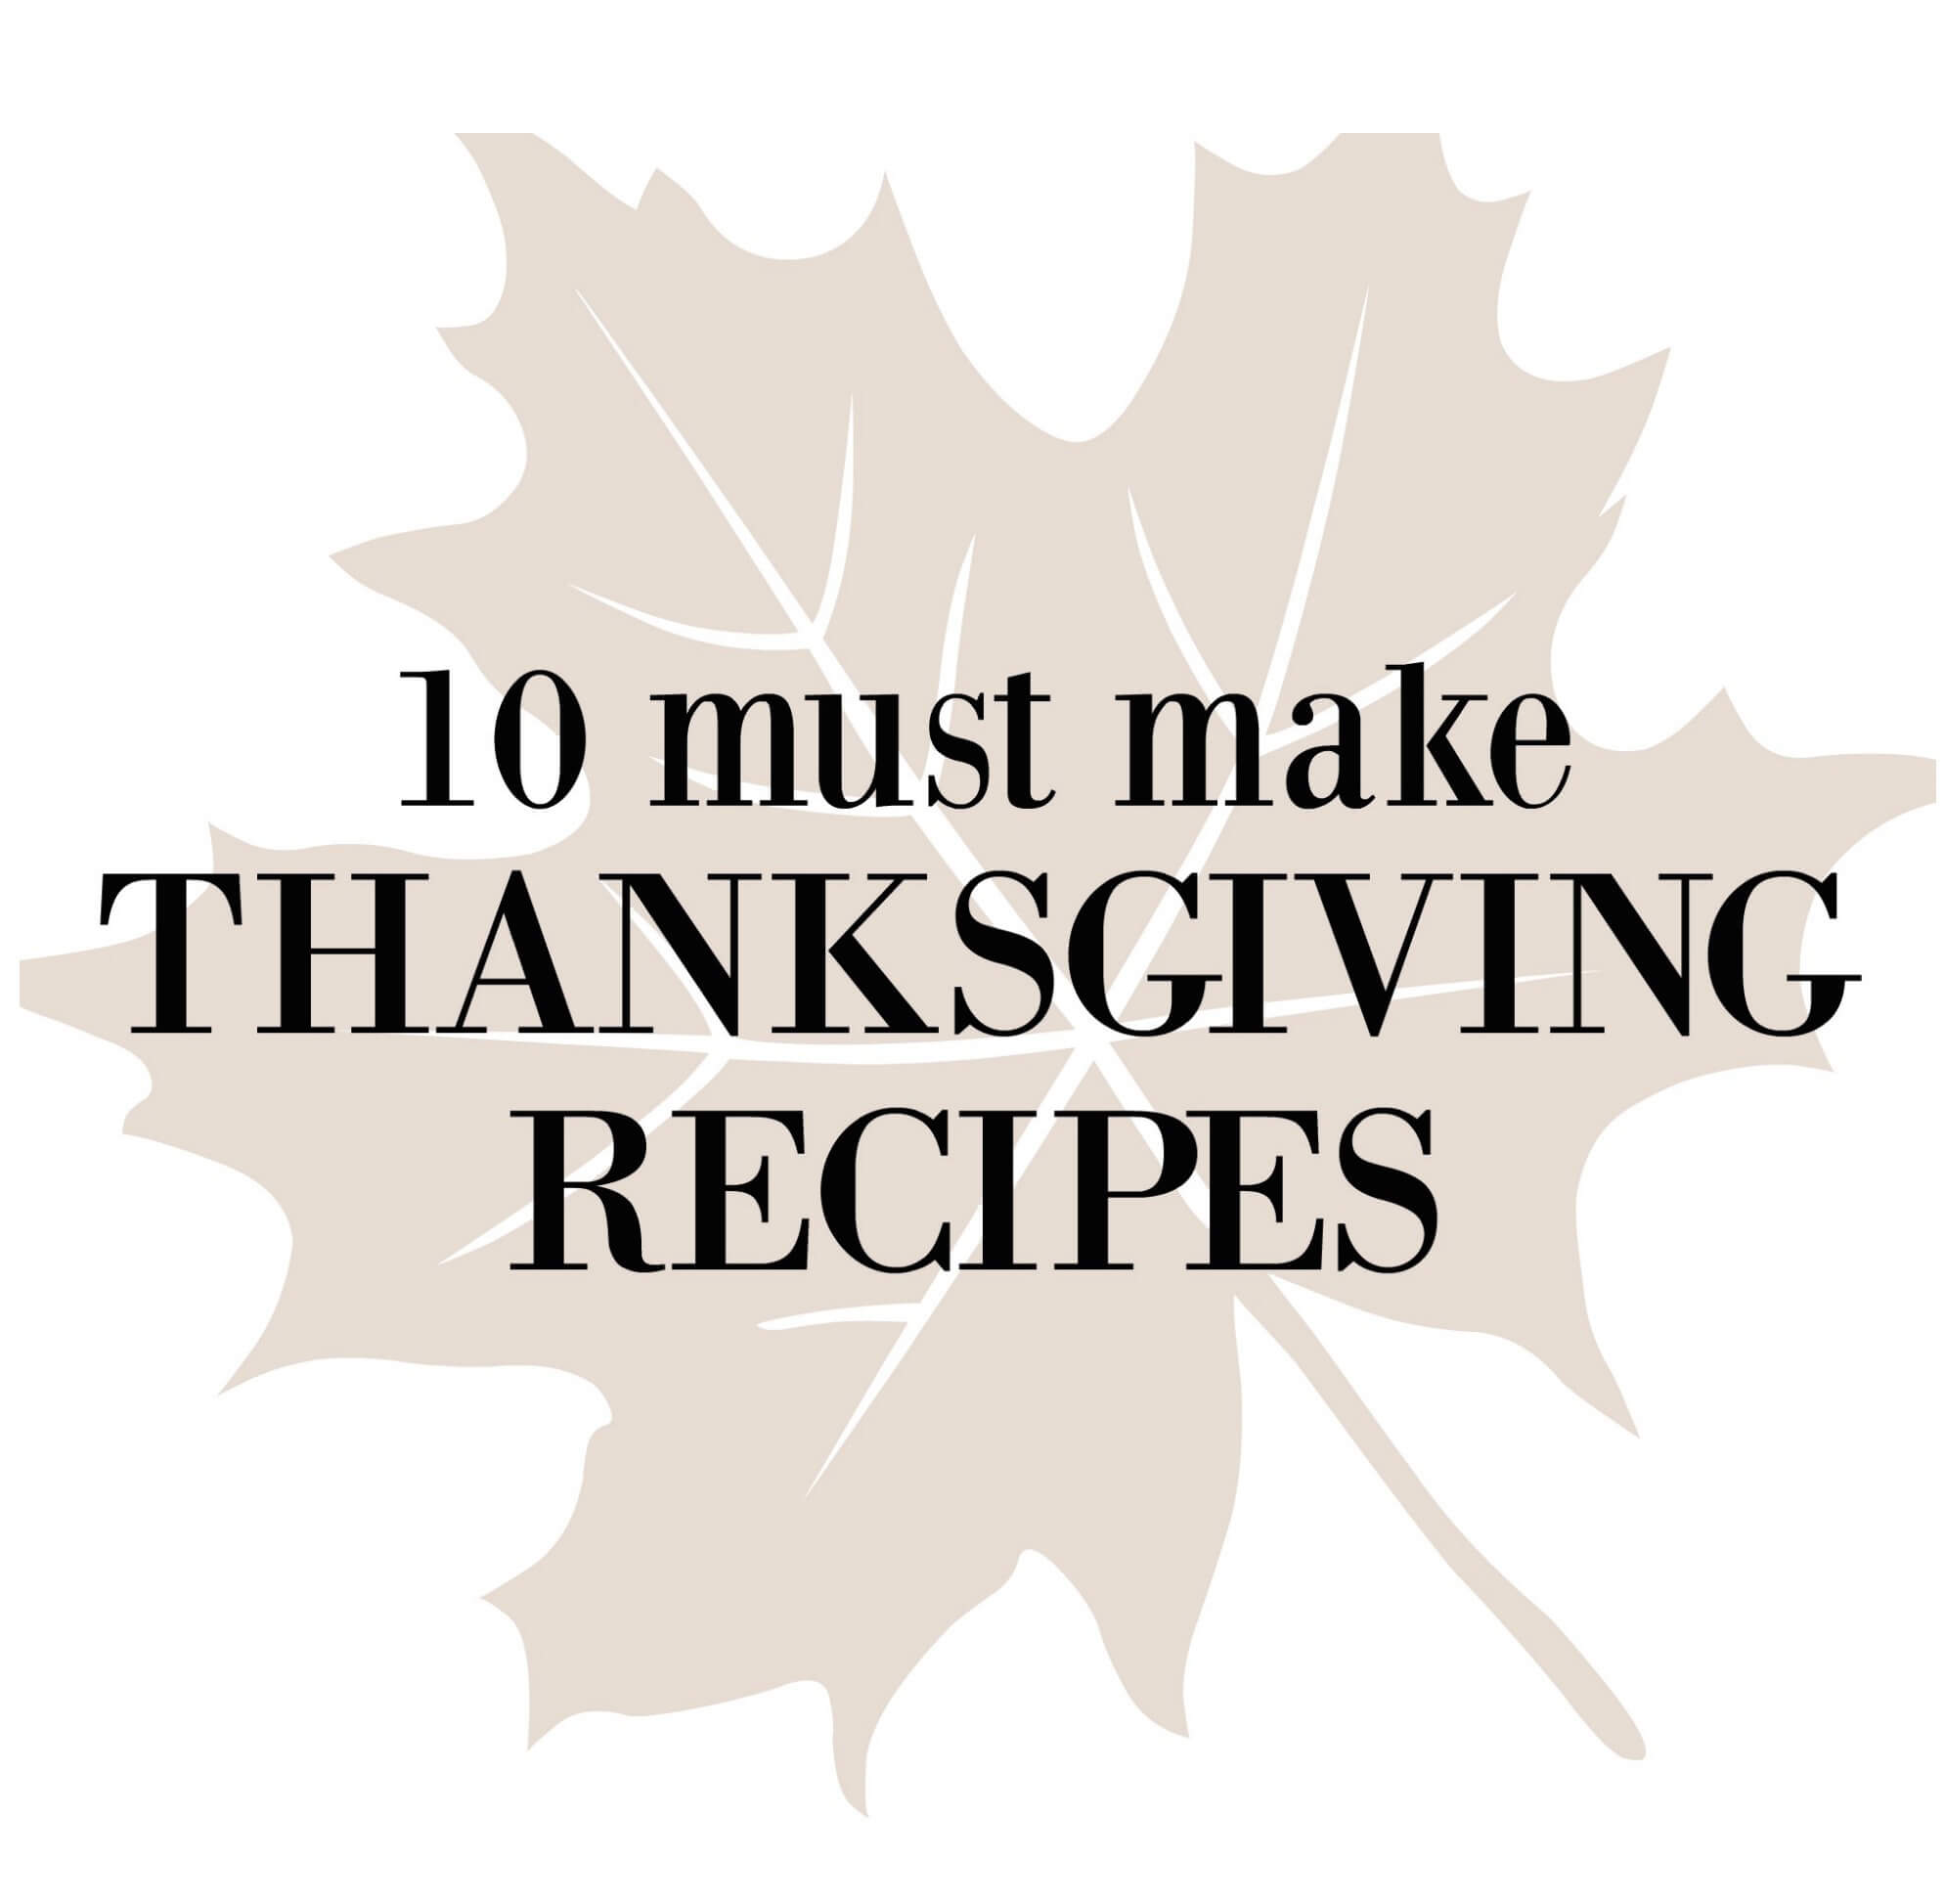 10 Must Make Thanksgiving Recipes!